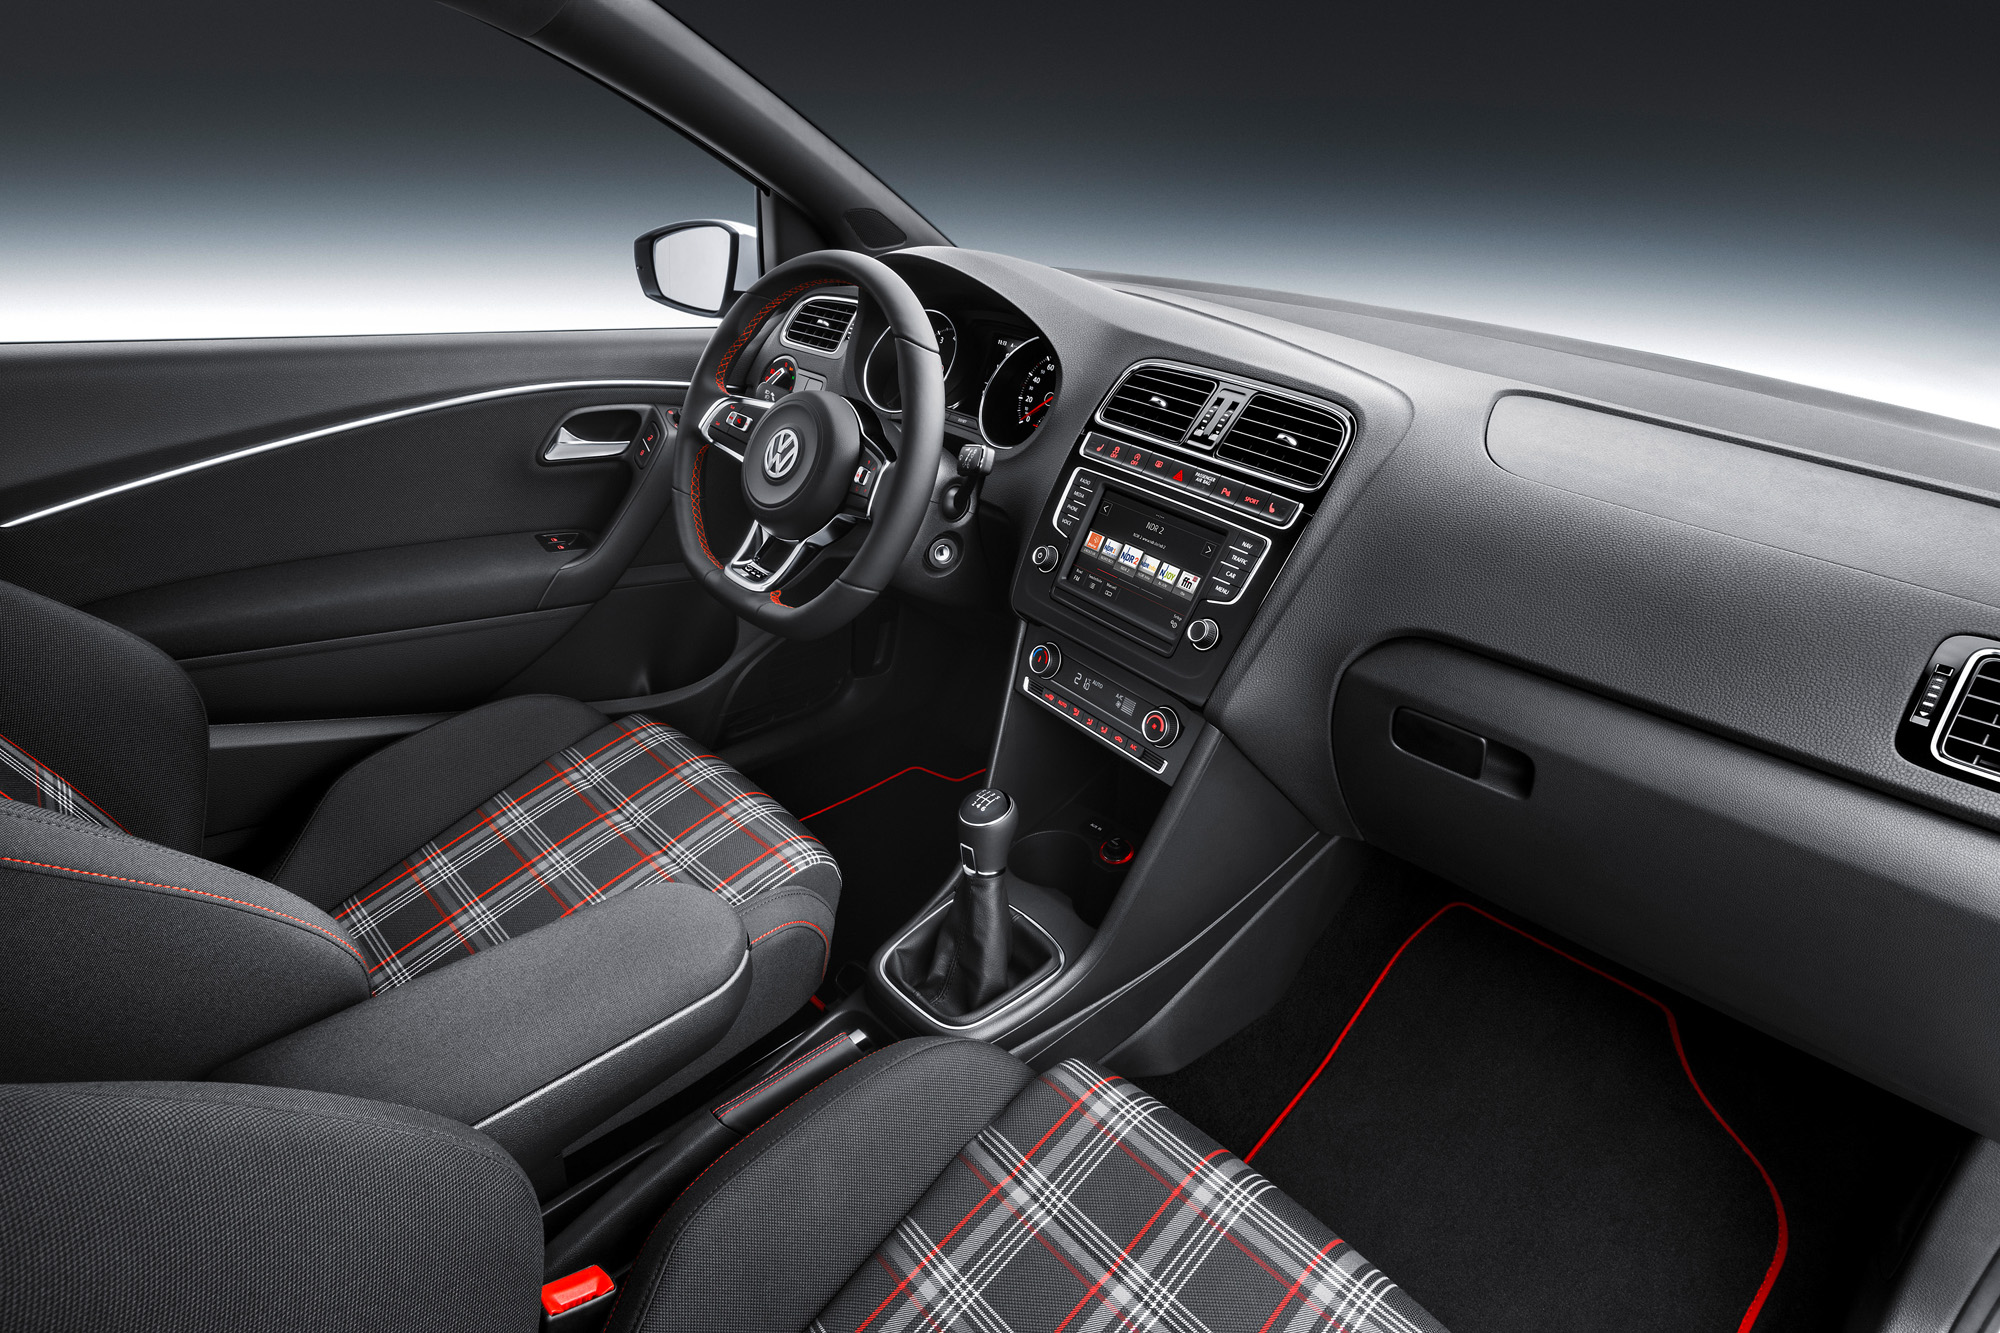 VW Polo GTI (6C) - gelifteter Kraftzwerg kommt mit 192 PS | Tuning ...